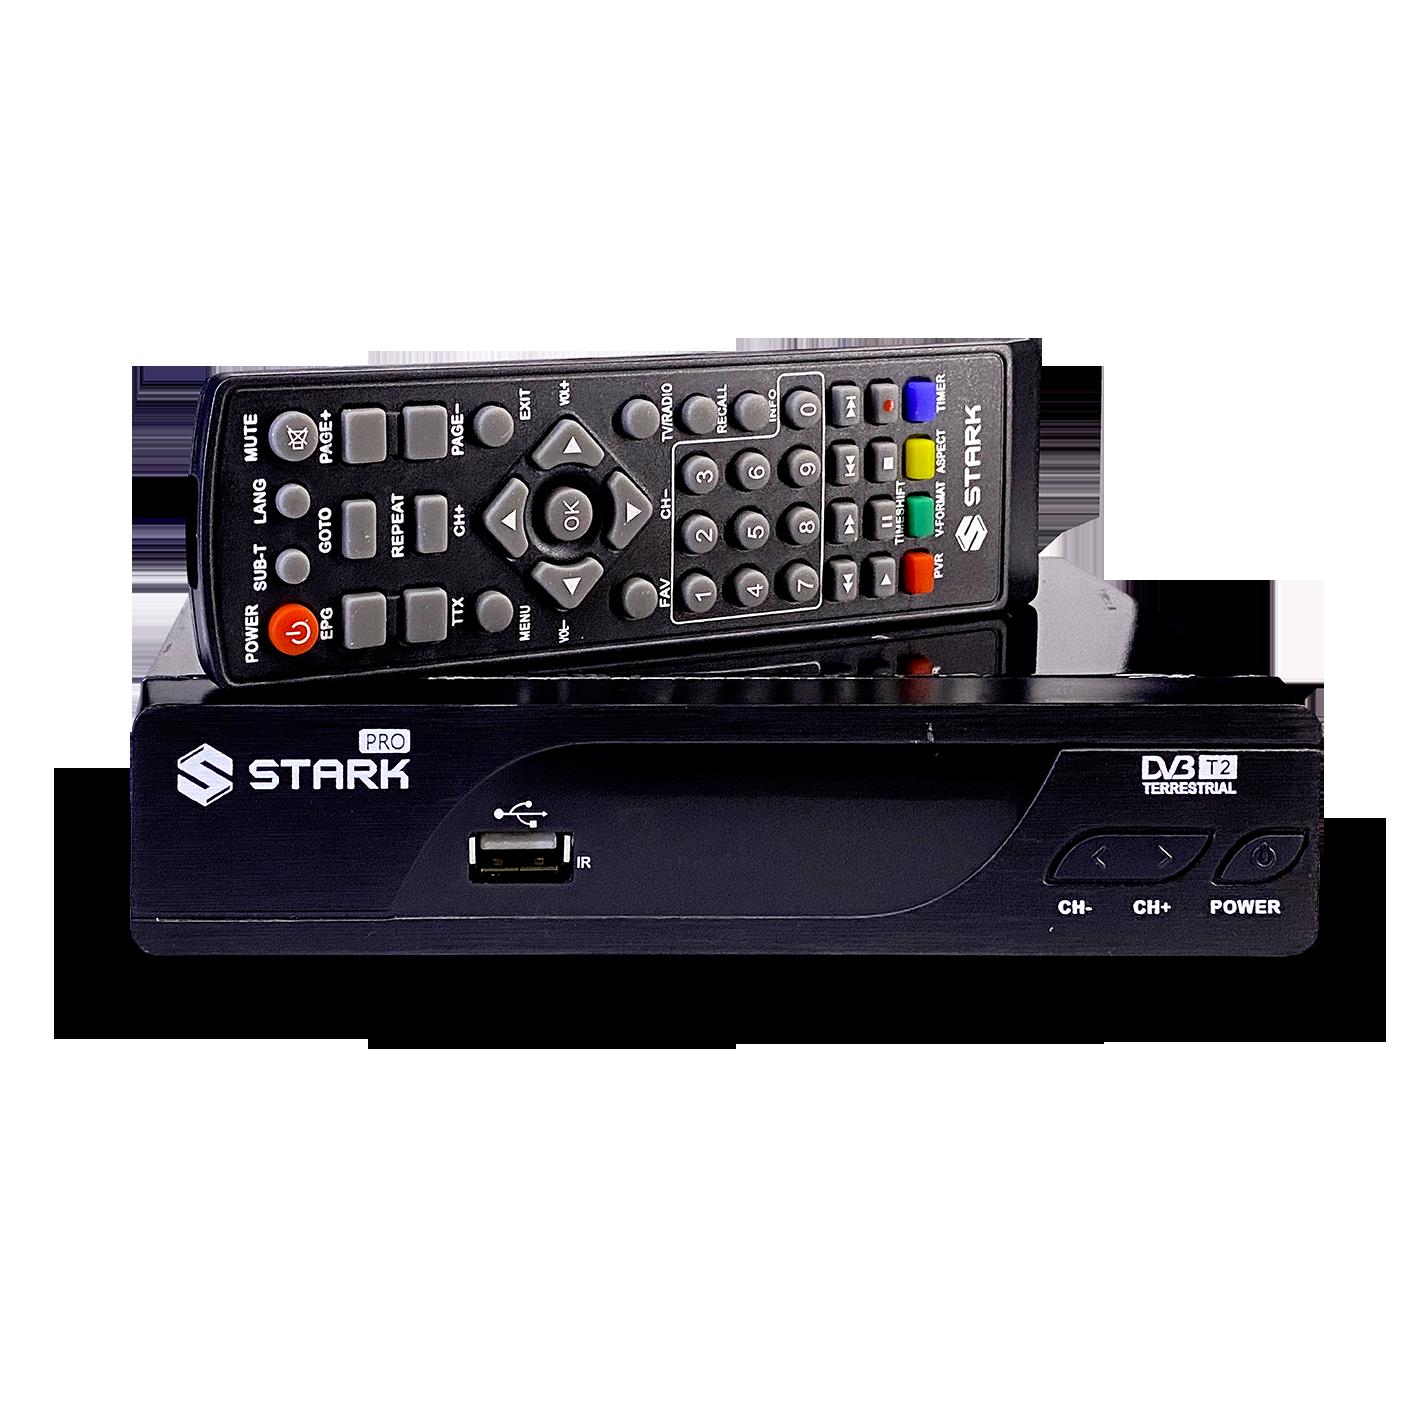 STARK PRO Set Top Box DVB-T2 PVR, teletex, metalno kućište (Slika 3)